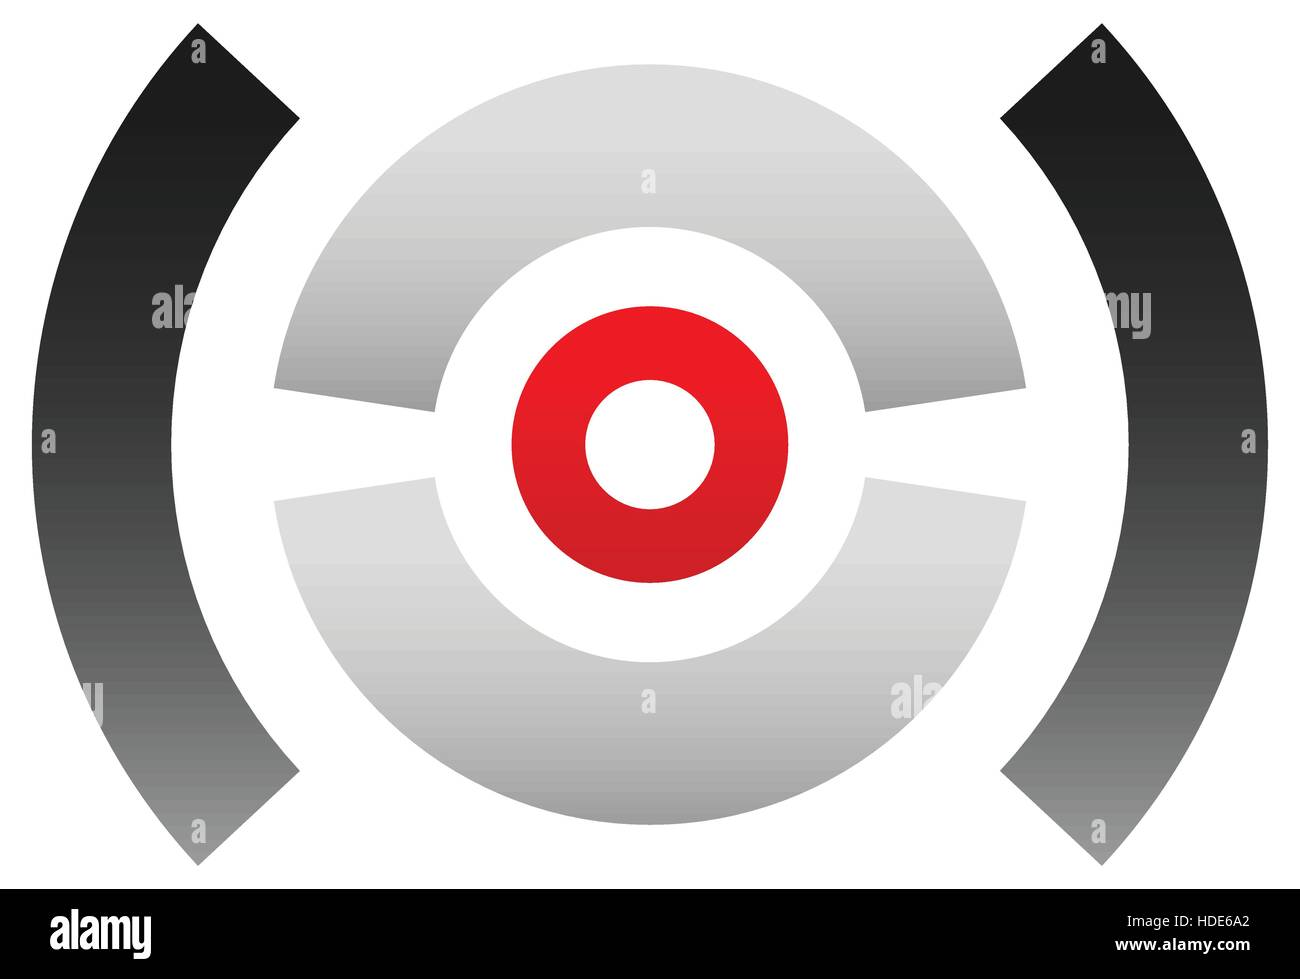 Crosshair icon target symbol pinpoint bullseye sign concentric crosshair icon target symbol pinpoint bullseye sign concentric segmented circles with red dot at center buycottarizona